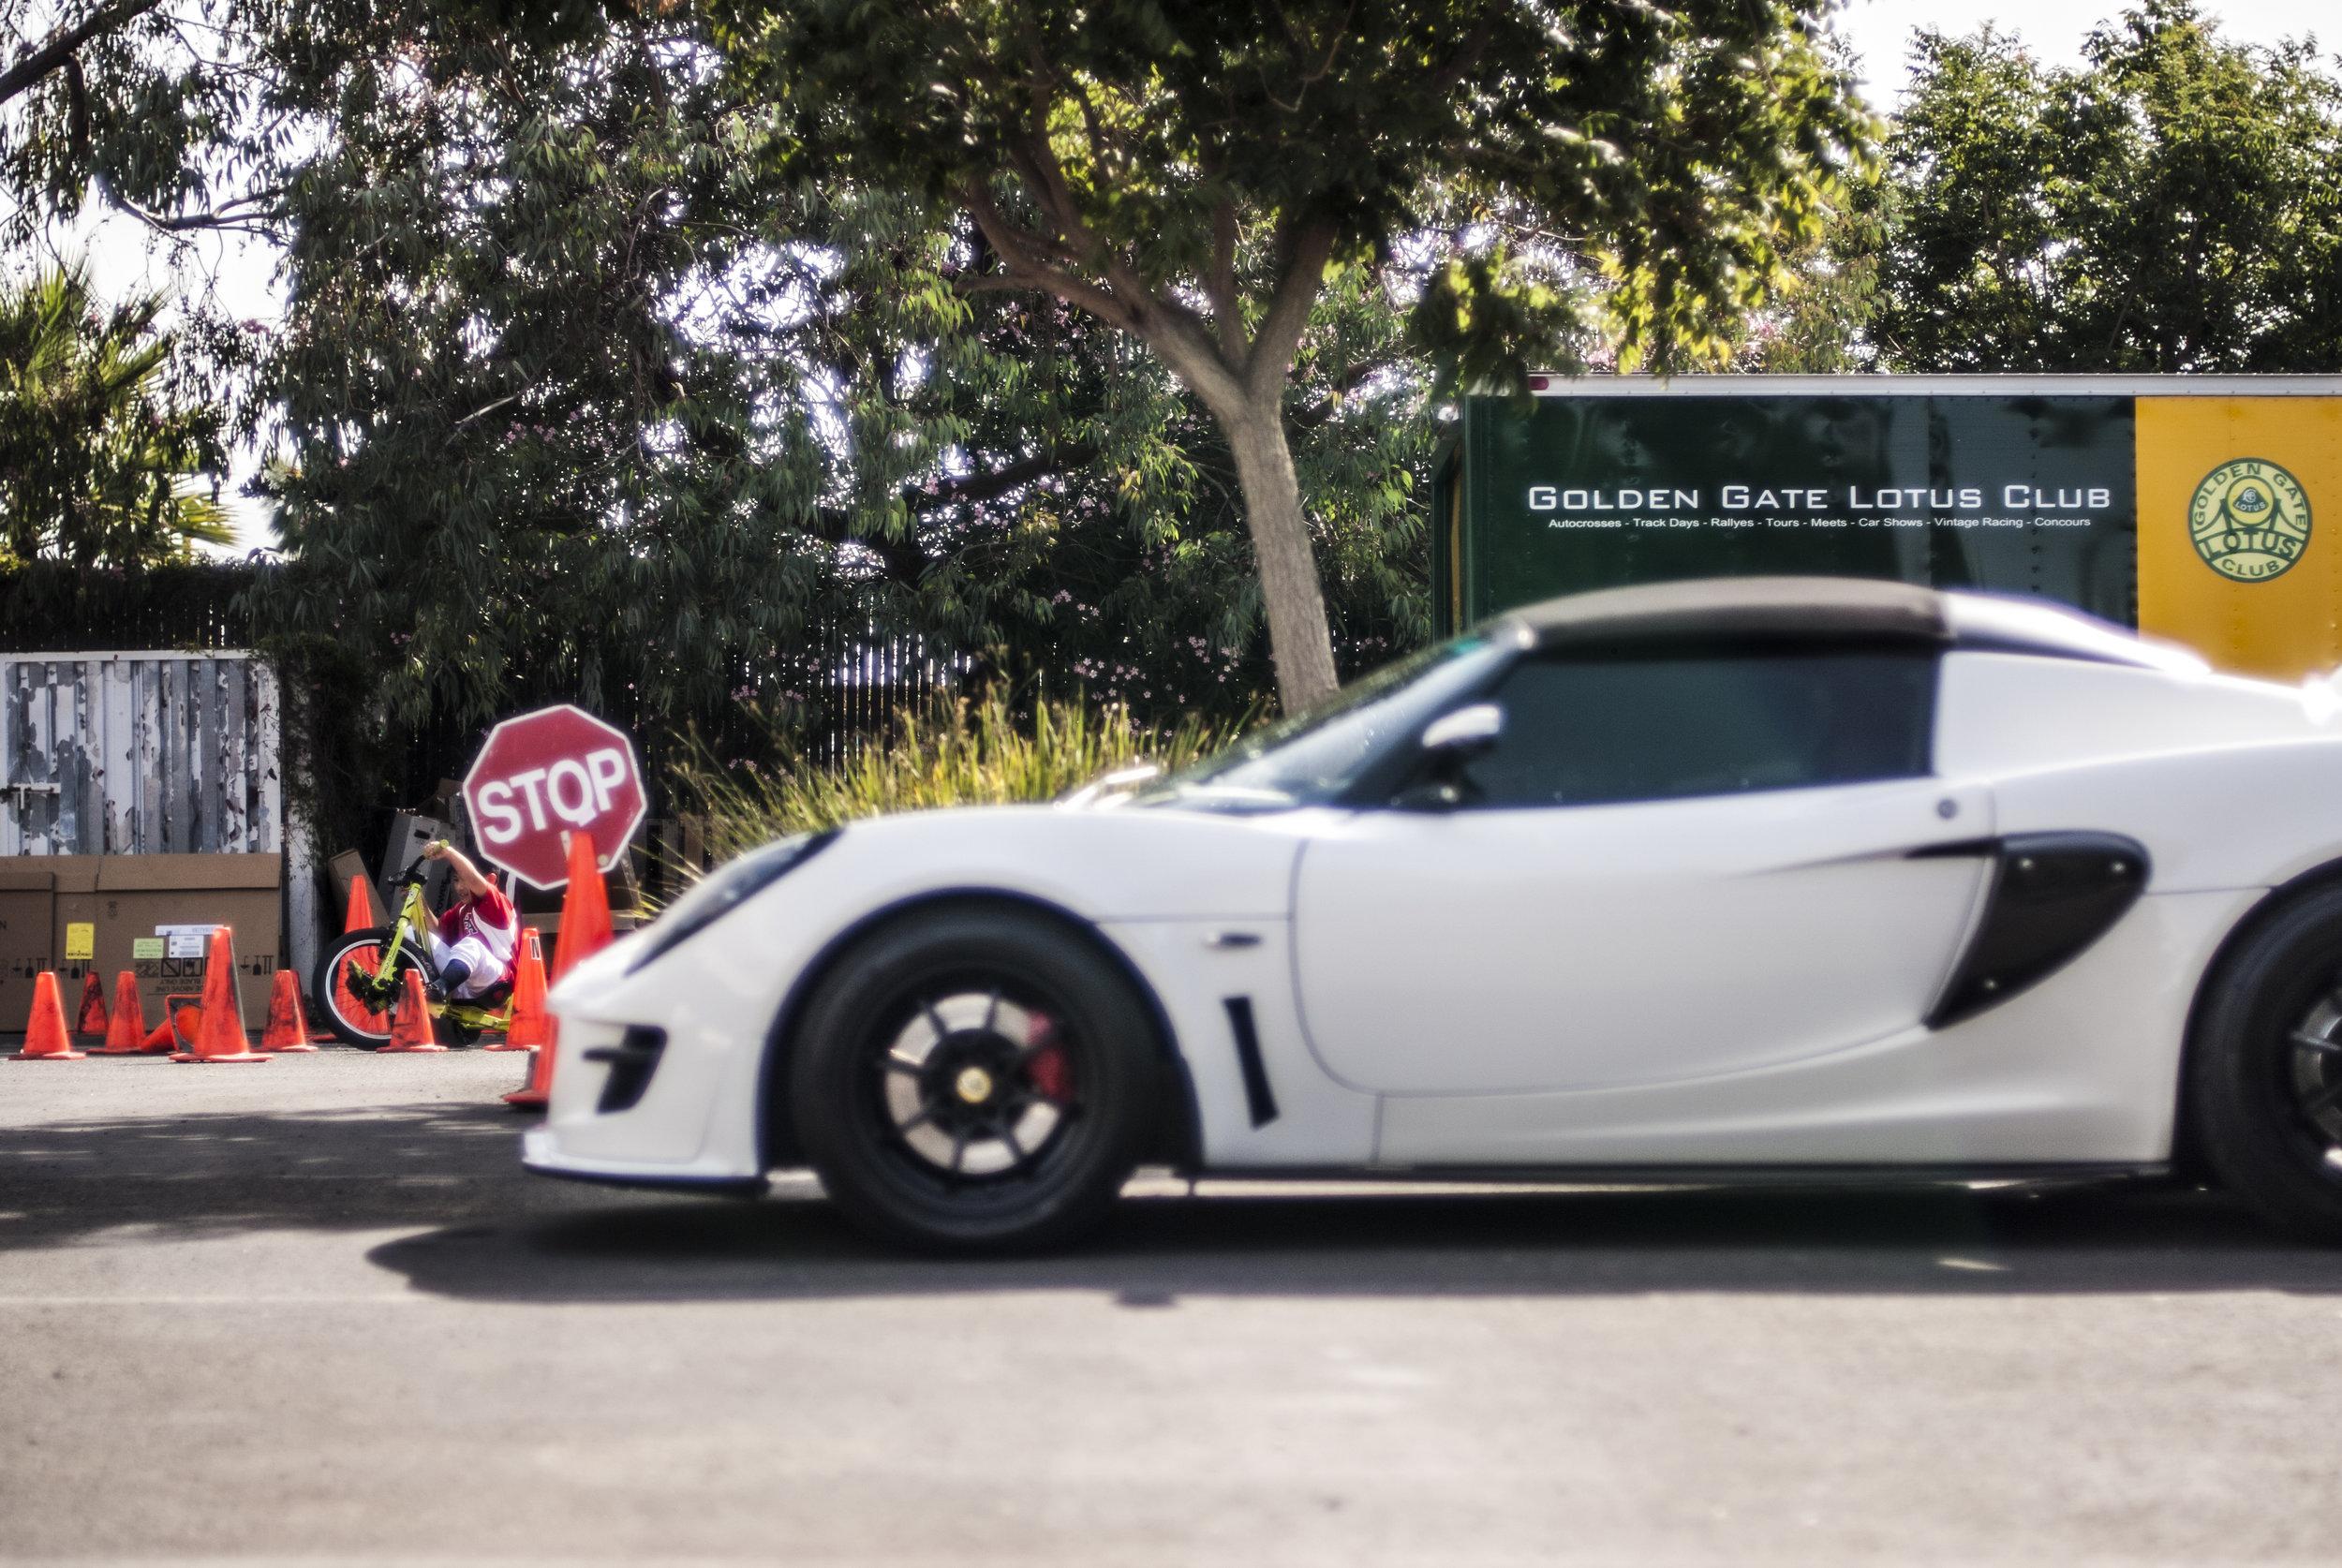 gglc autocross  Donated by  GGLC . 1 winner. Estimated value: $65-75